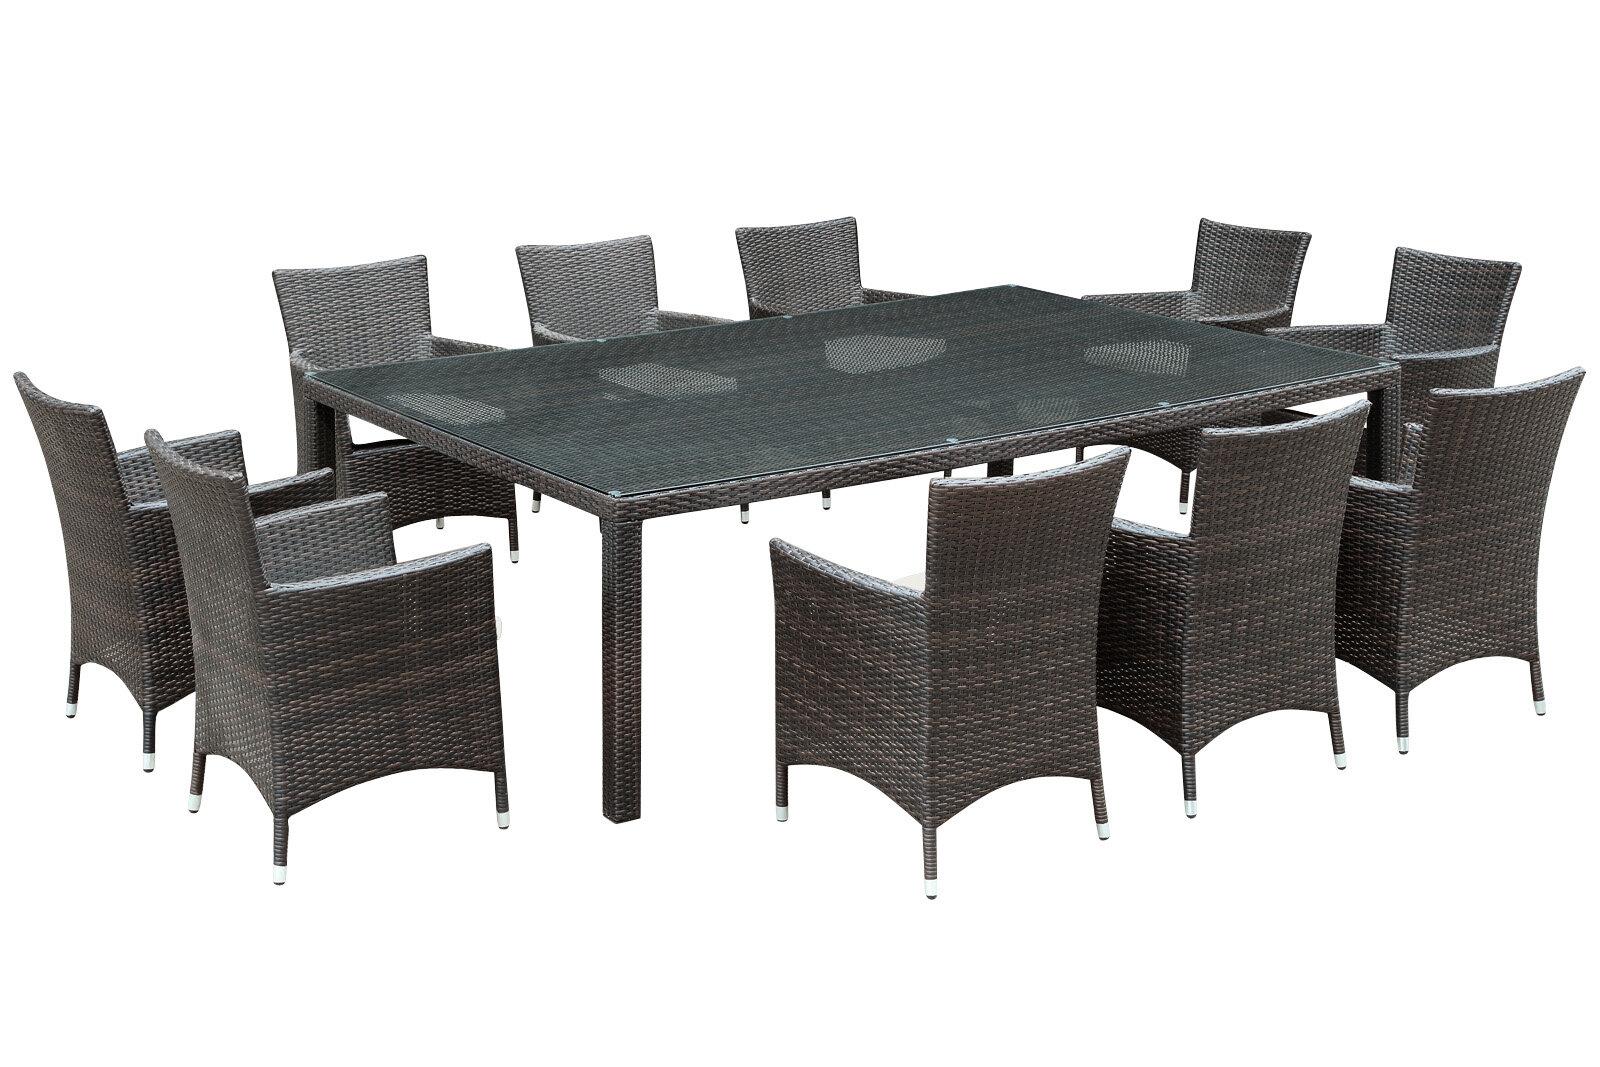 Modway Alfresco 11 Piece Dining Set With Cushions Wayfair